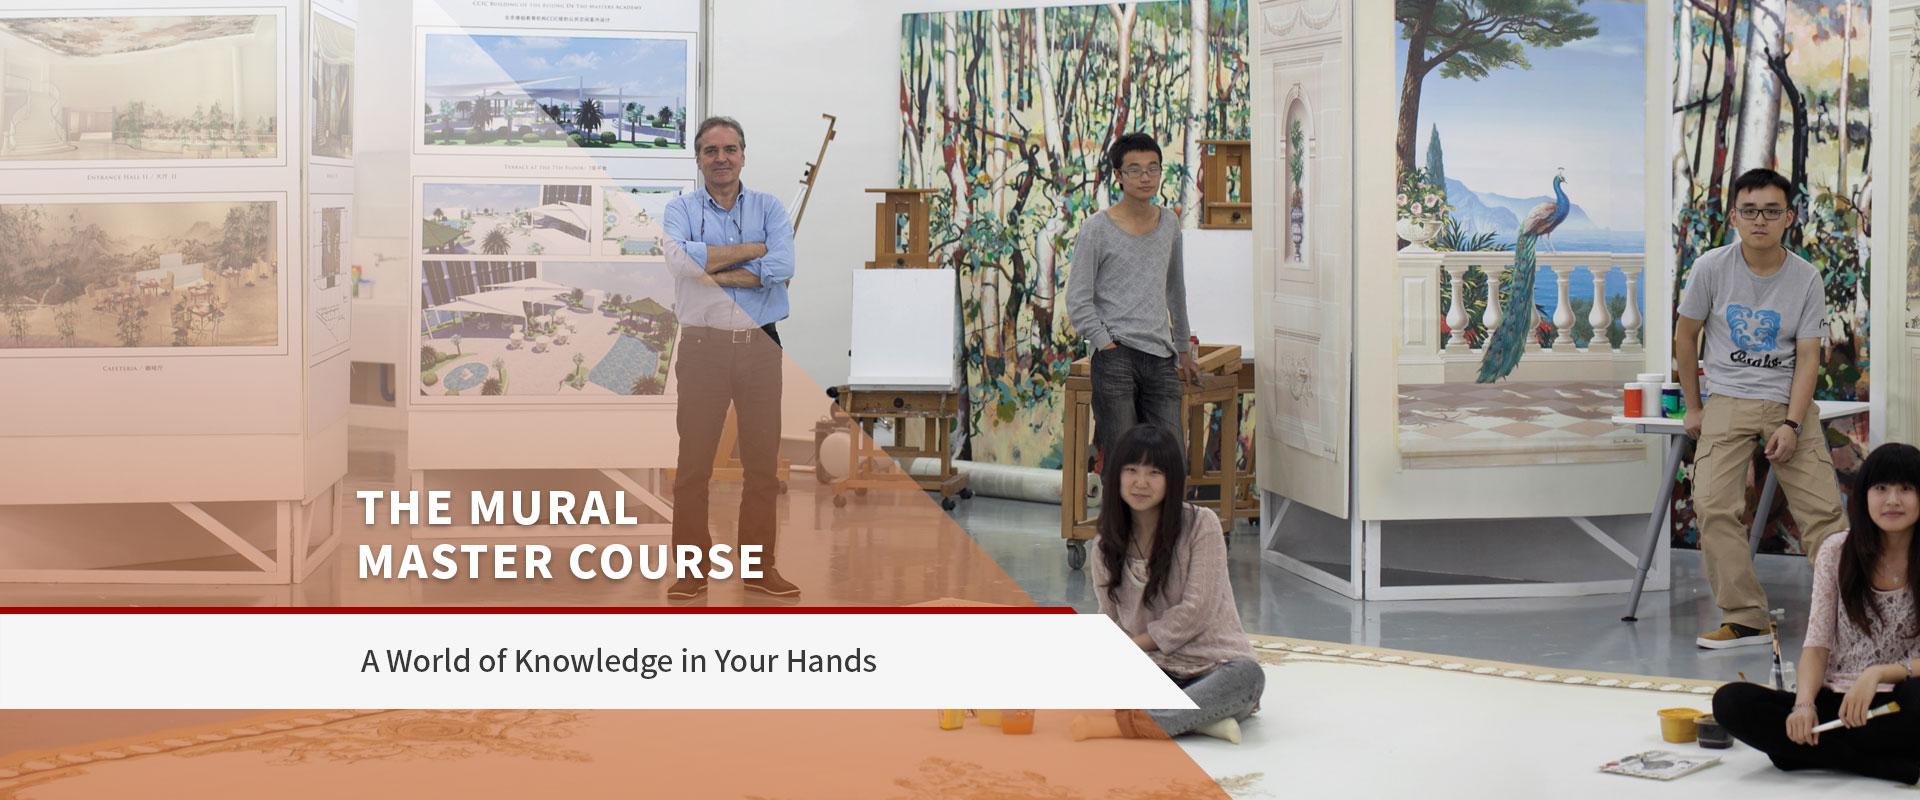 frescography-mural-master-course-2